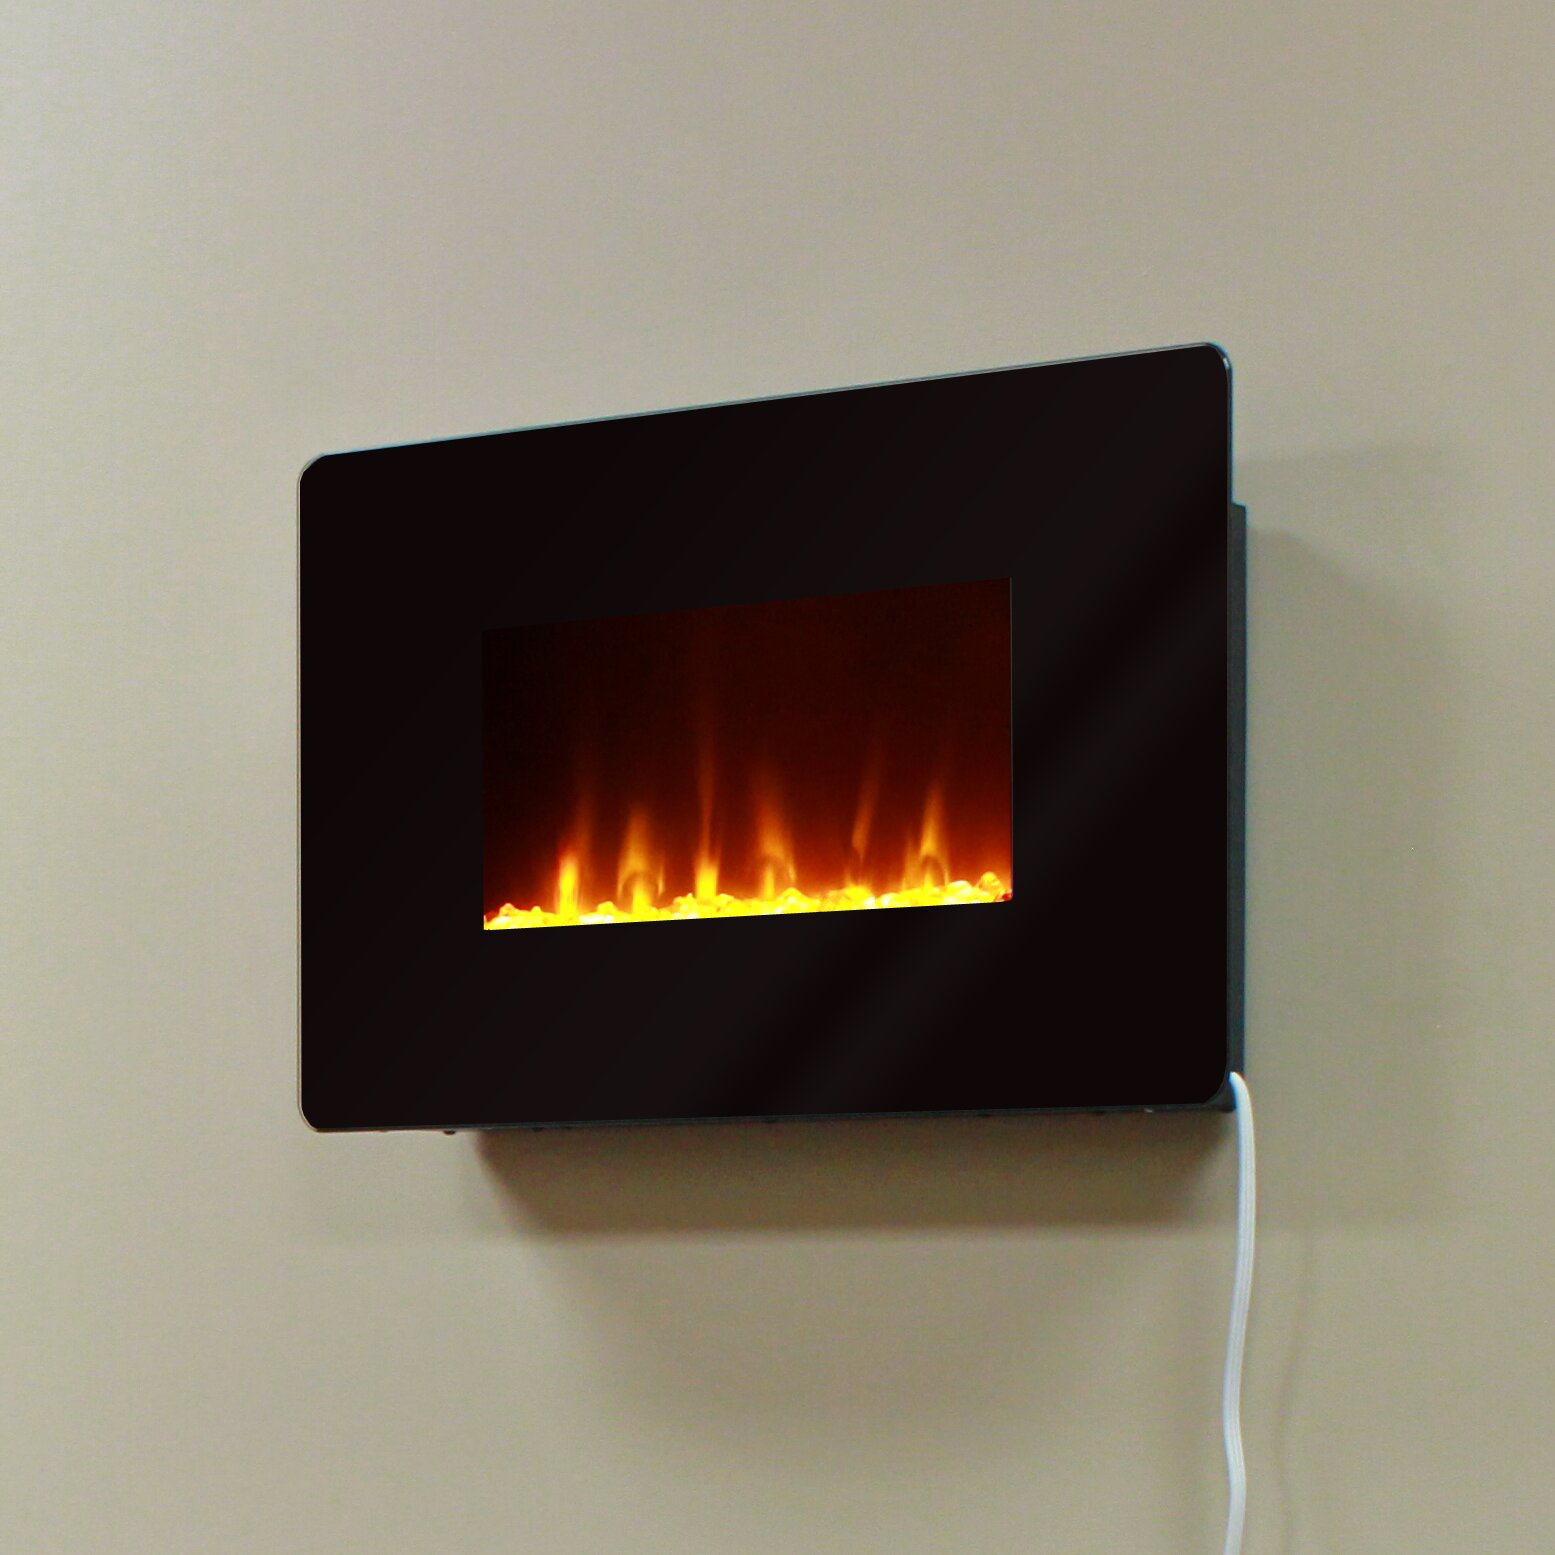 Muskoka Wall Mount Electric Fireplace Reviews Wayfair